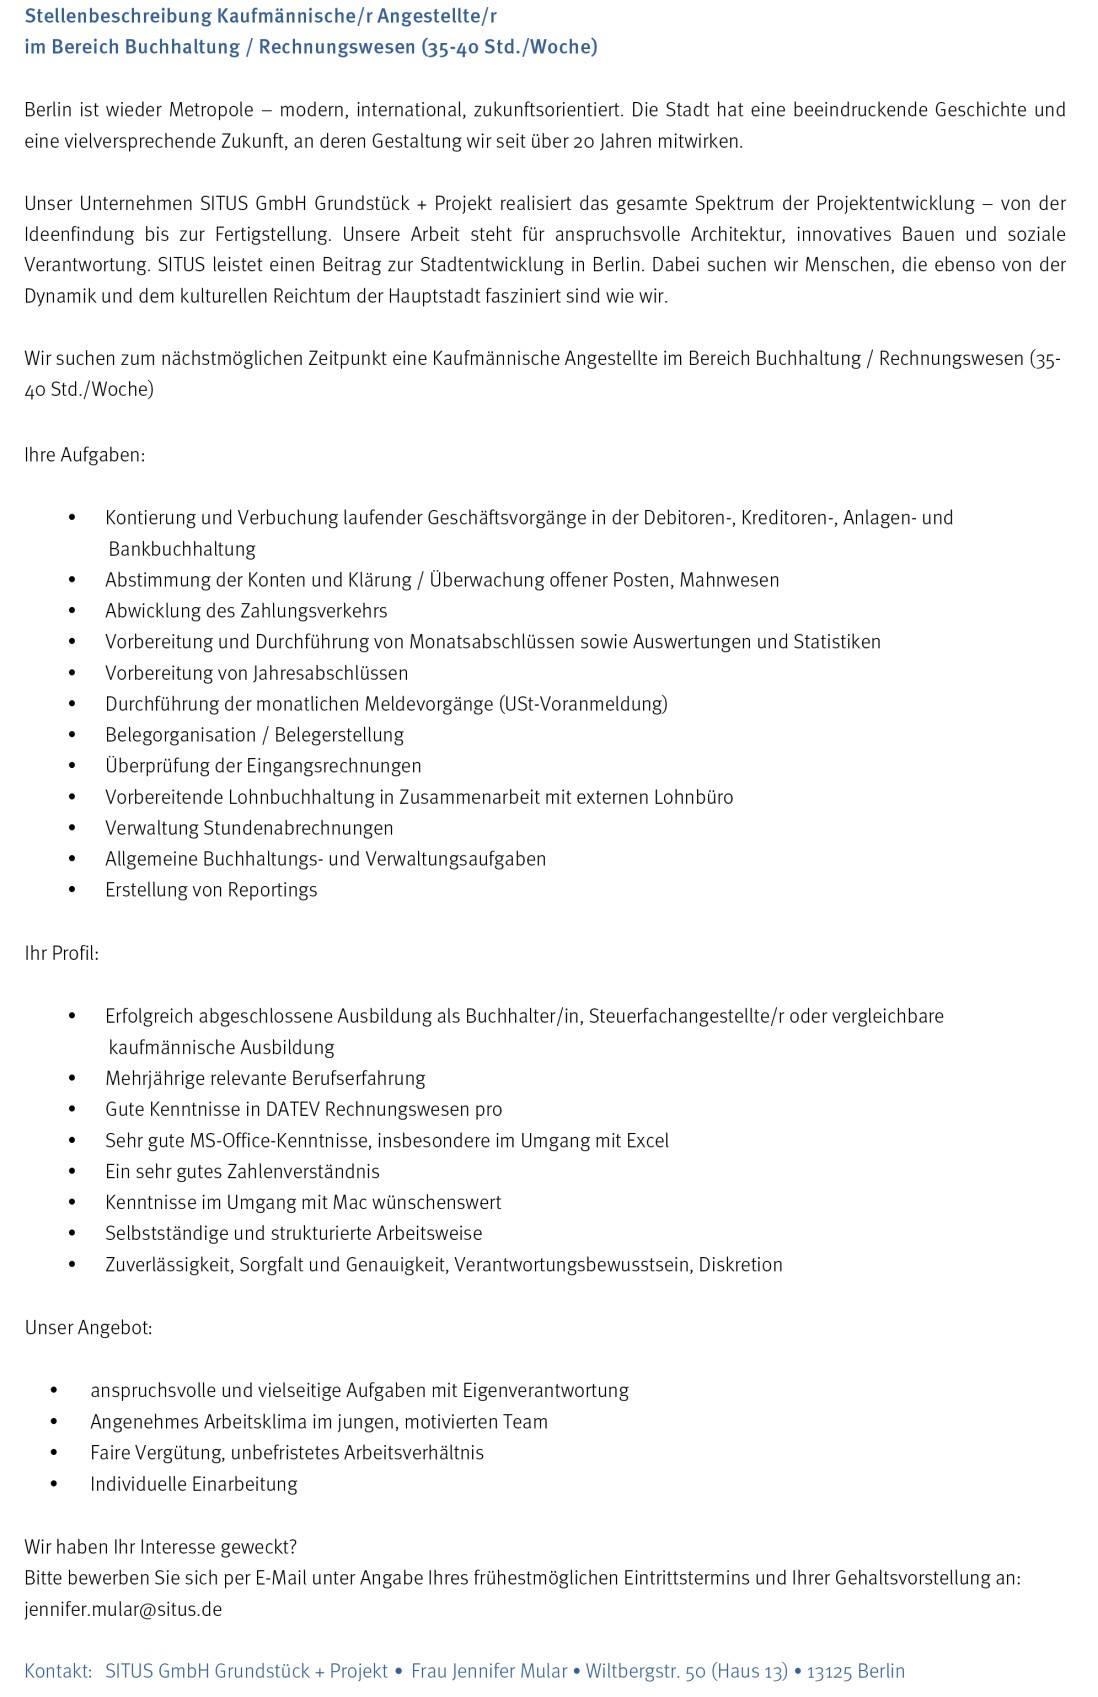 Microsoft Word - Stellenbeschreibung kfm. MA Buchhaltung MUSTER.